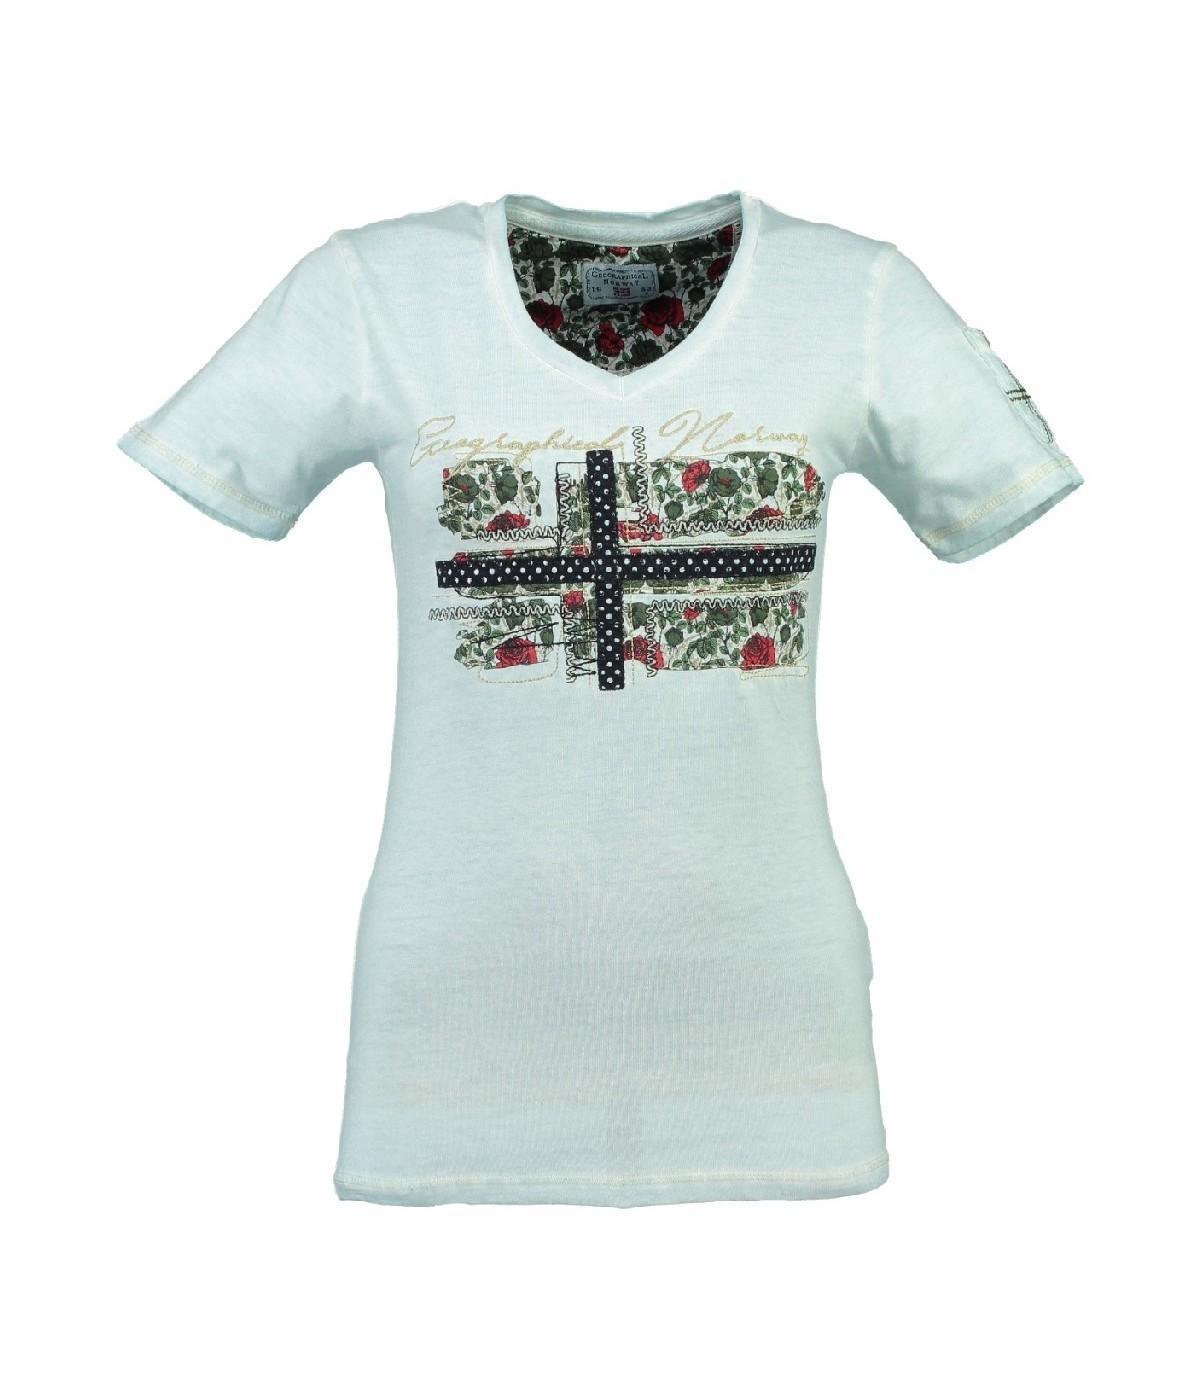 T-shirt Femme Geographical Norway Jbeautà© Bleu